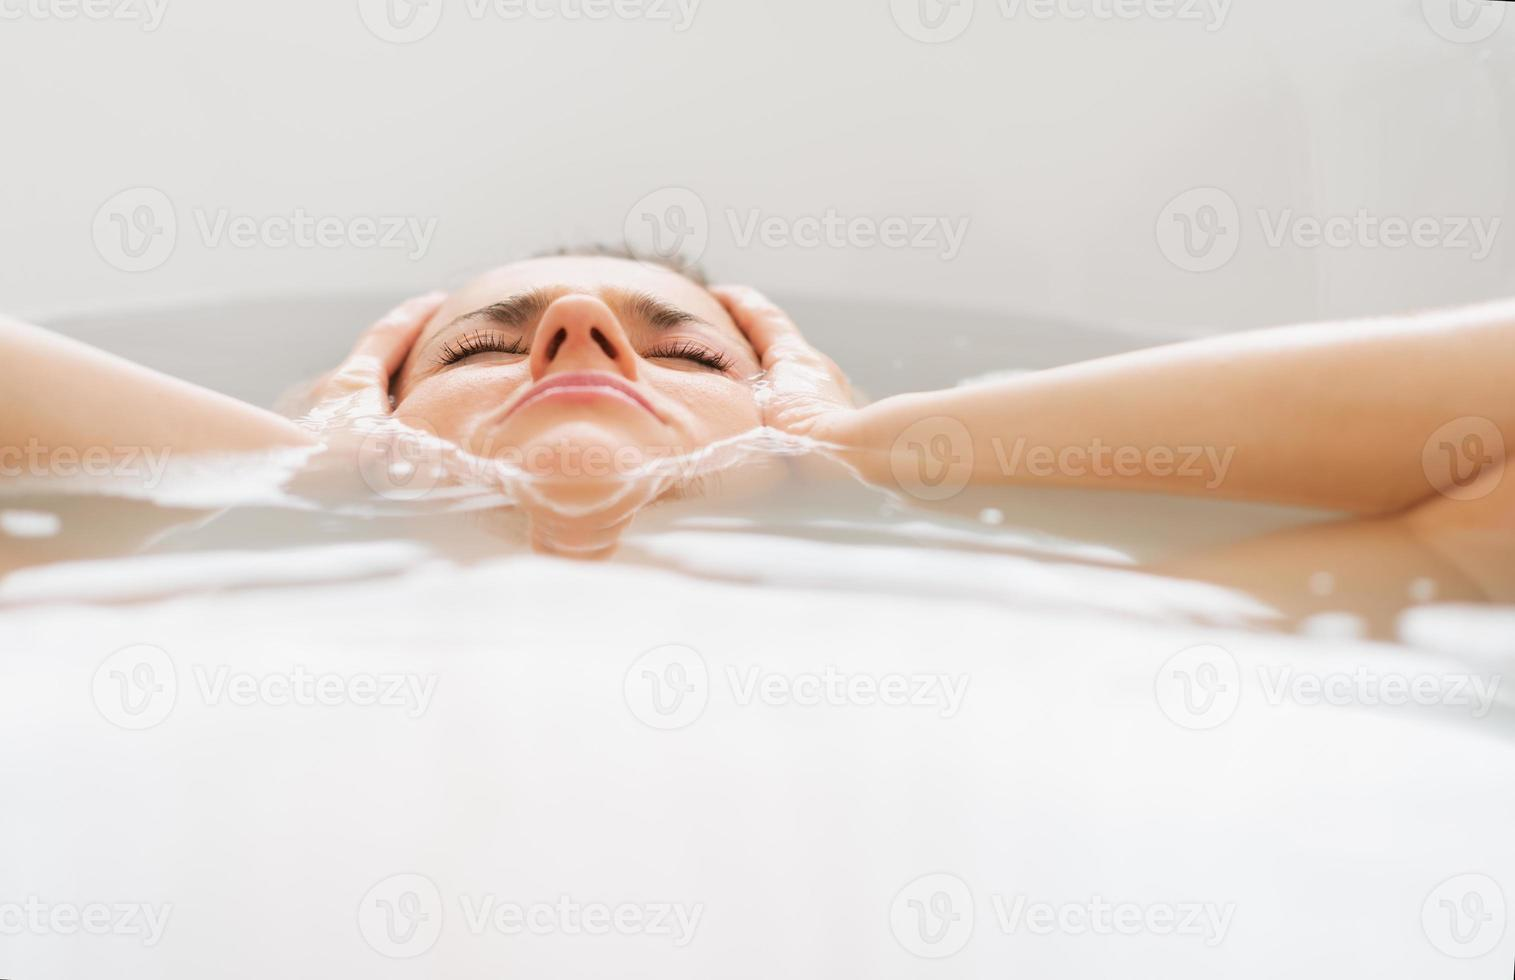 joven estresada tendido en la bañera foto